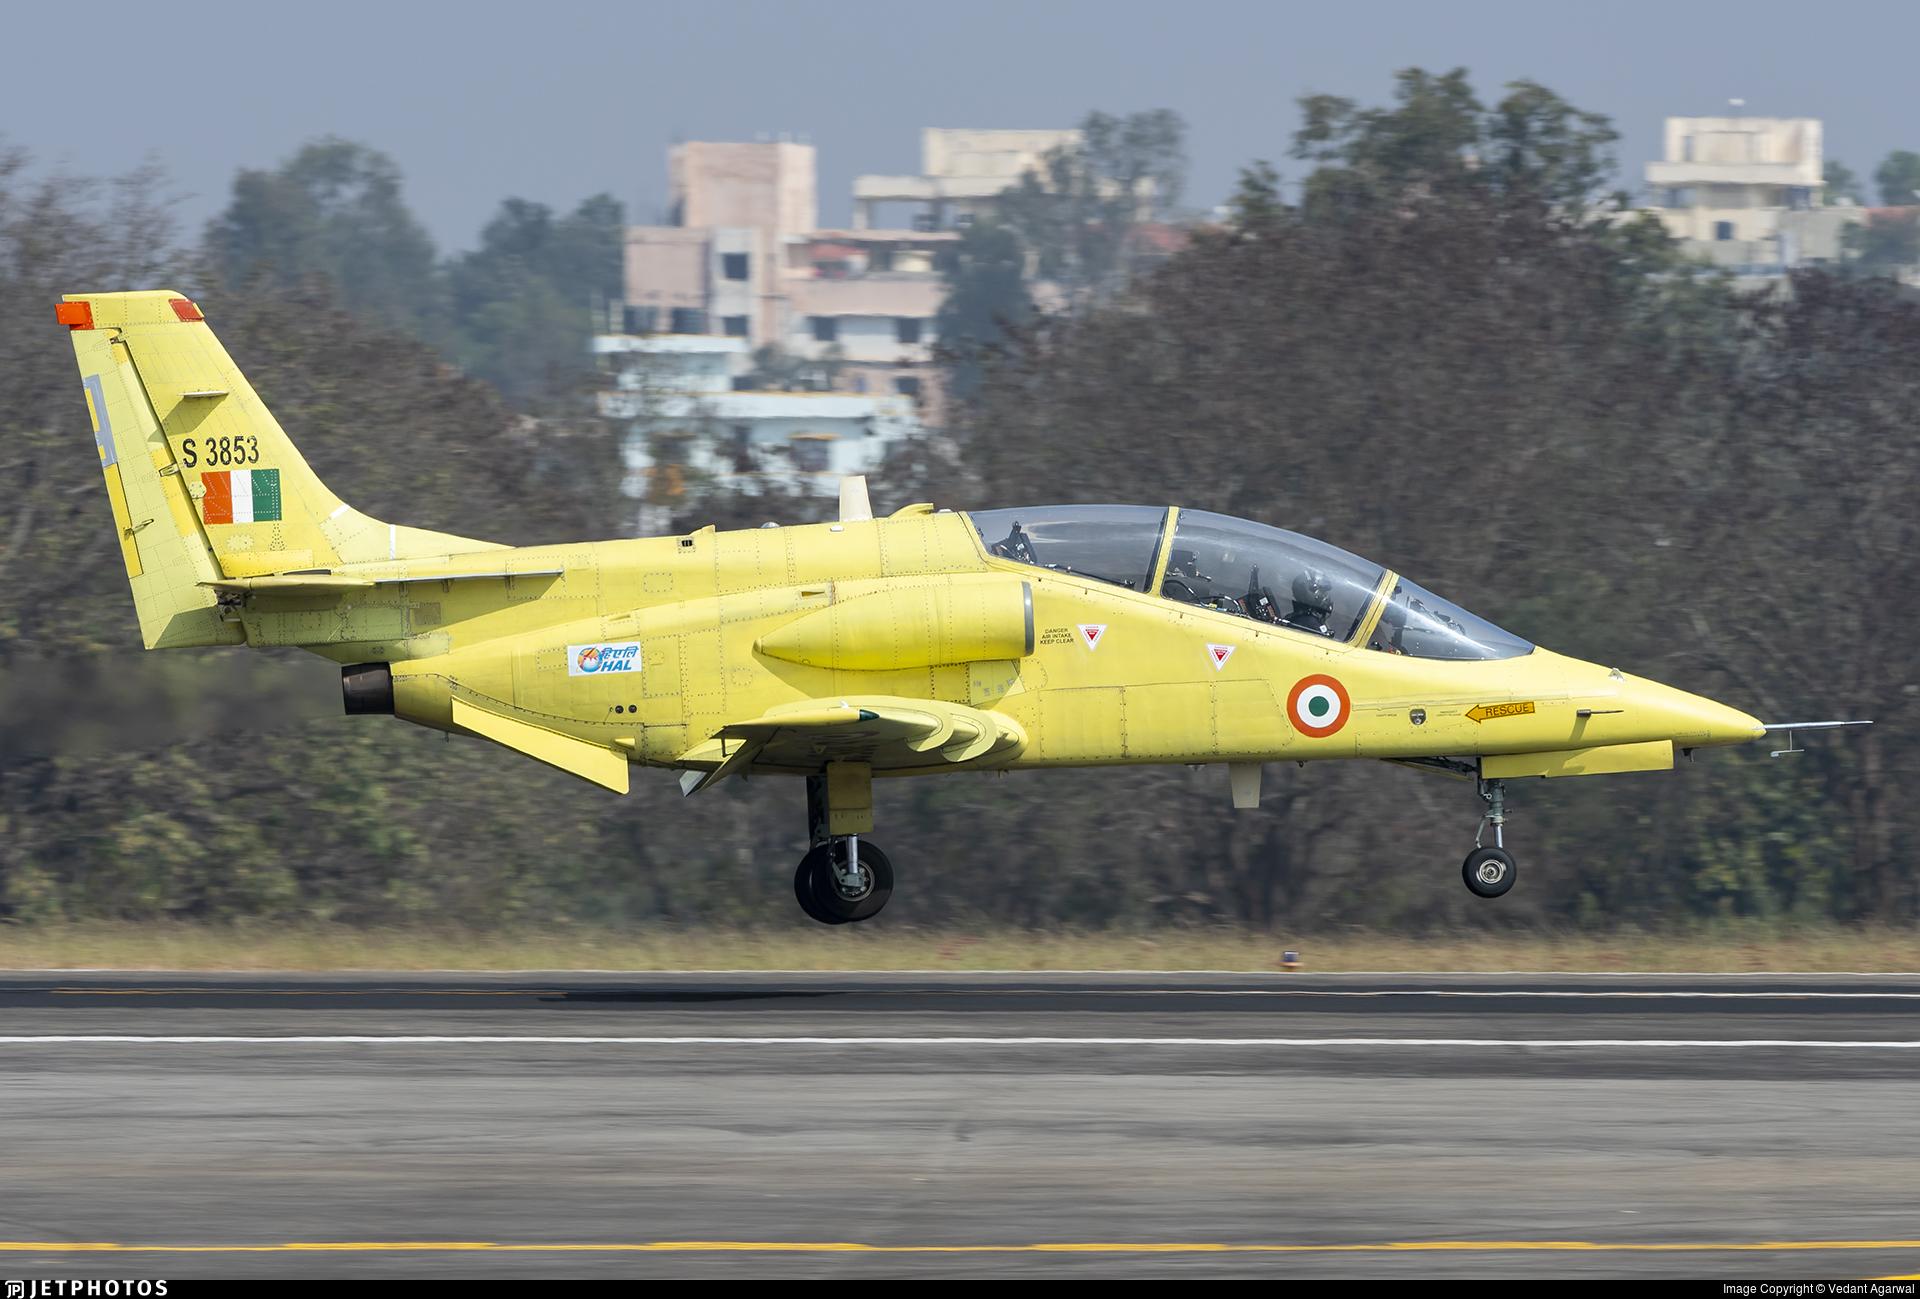 S3853 - Hindustan Aeronautics IJT - Hindustan Aeronautics